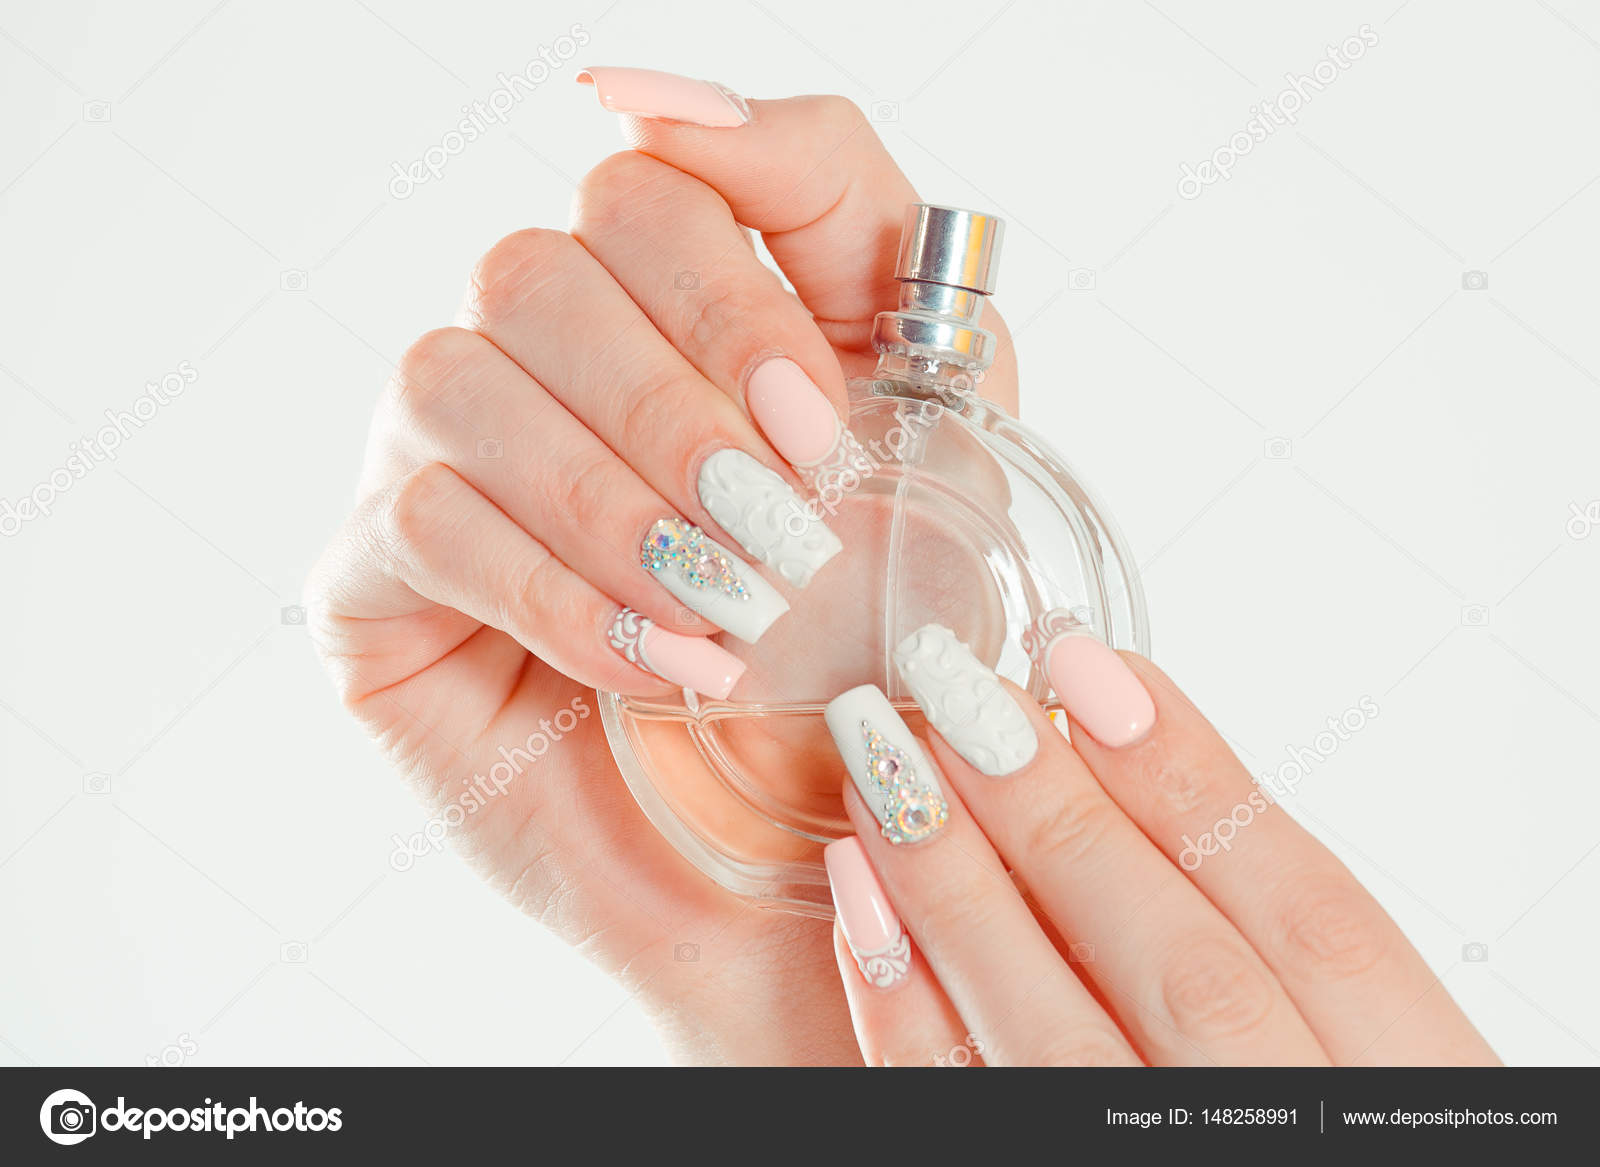 Closeup Nagel Poliert Pastell Bunt Lange Nagel Coral Pink Weiss Mit